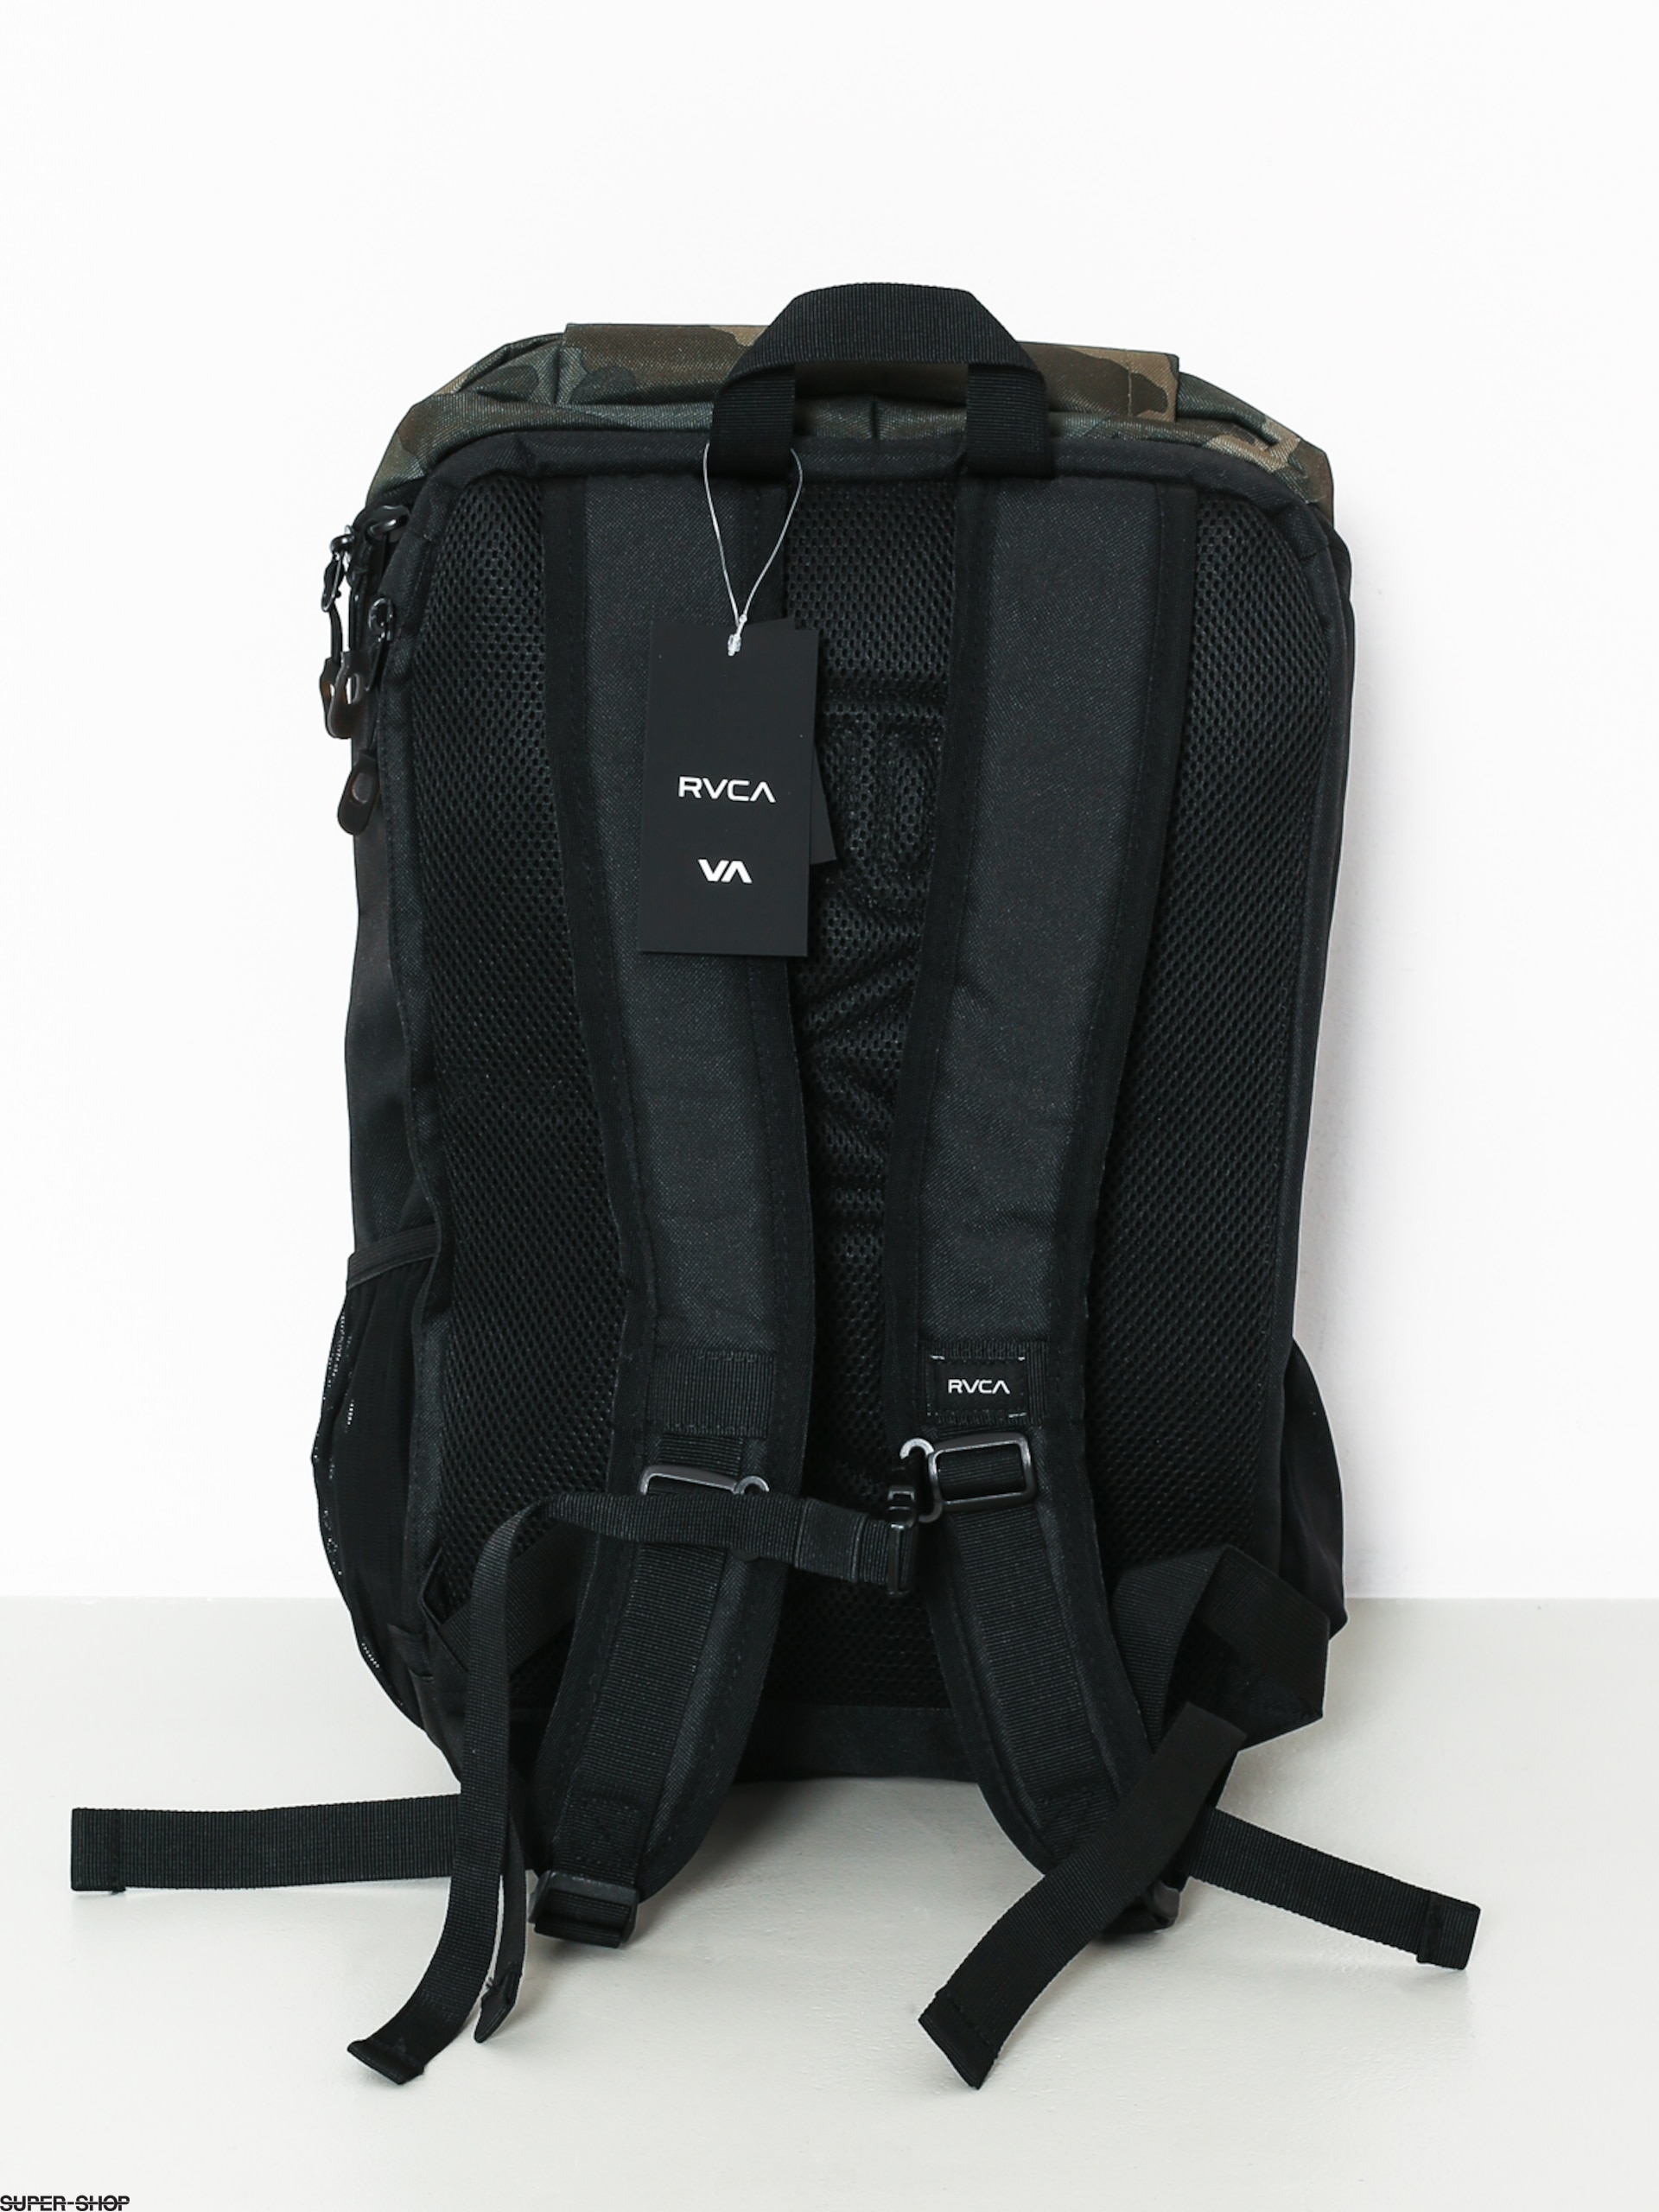 RVCA Voyage Skate Backpack (camo) ece4030aa21a0